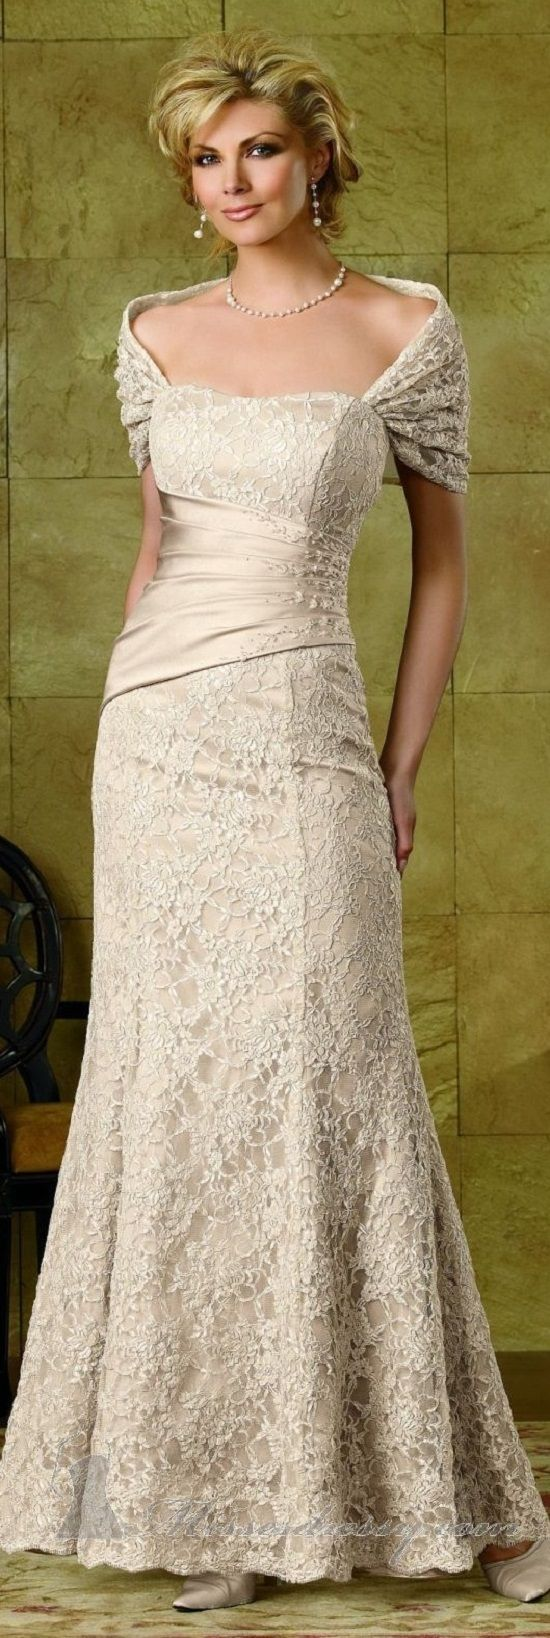 Best 25+ Older bride ideas on Pinterest   Wedding dress ...